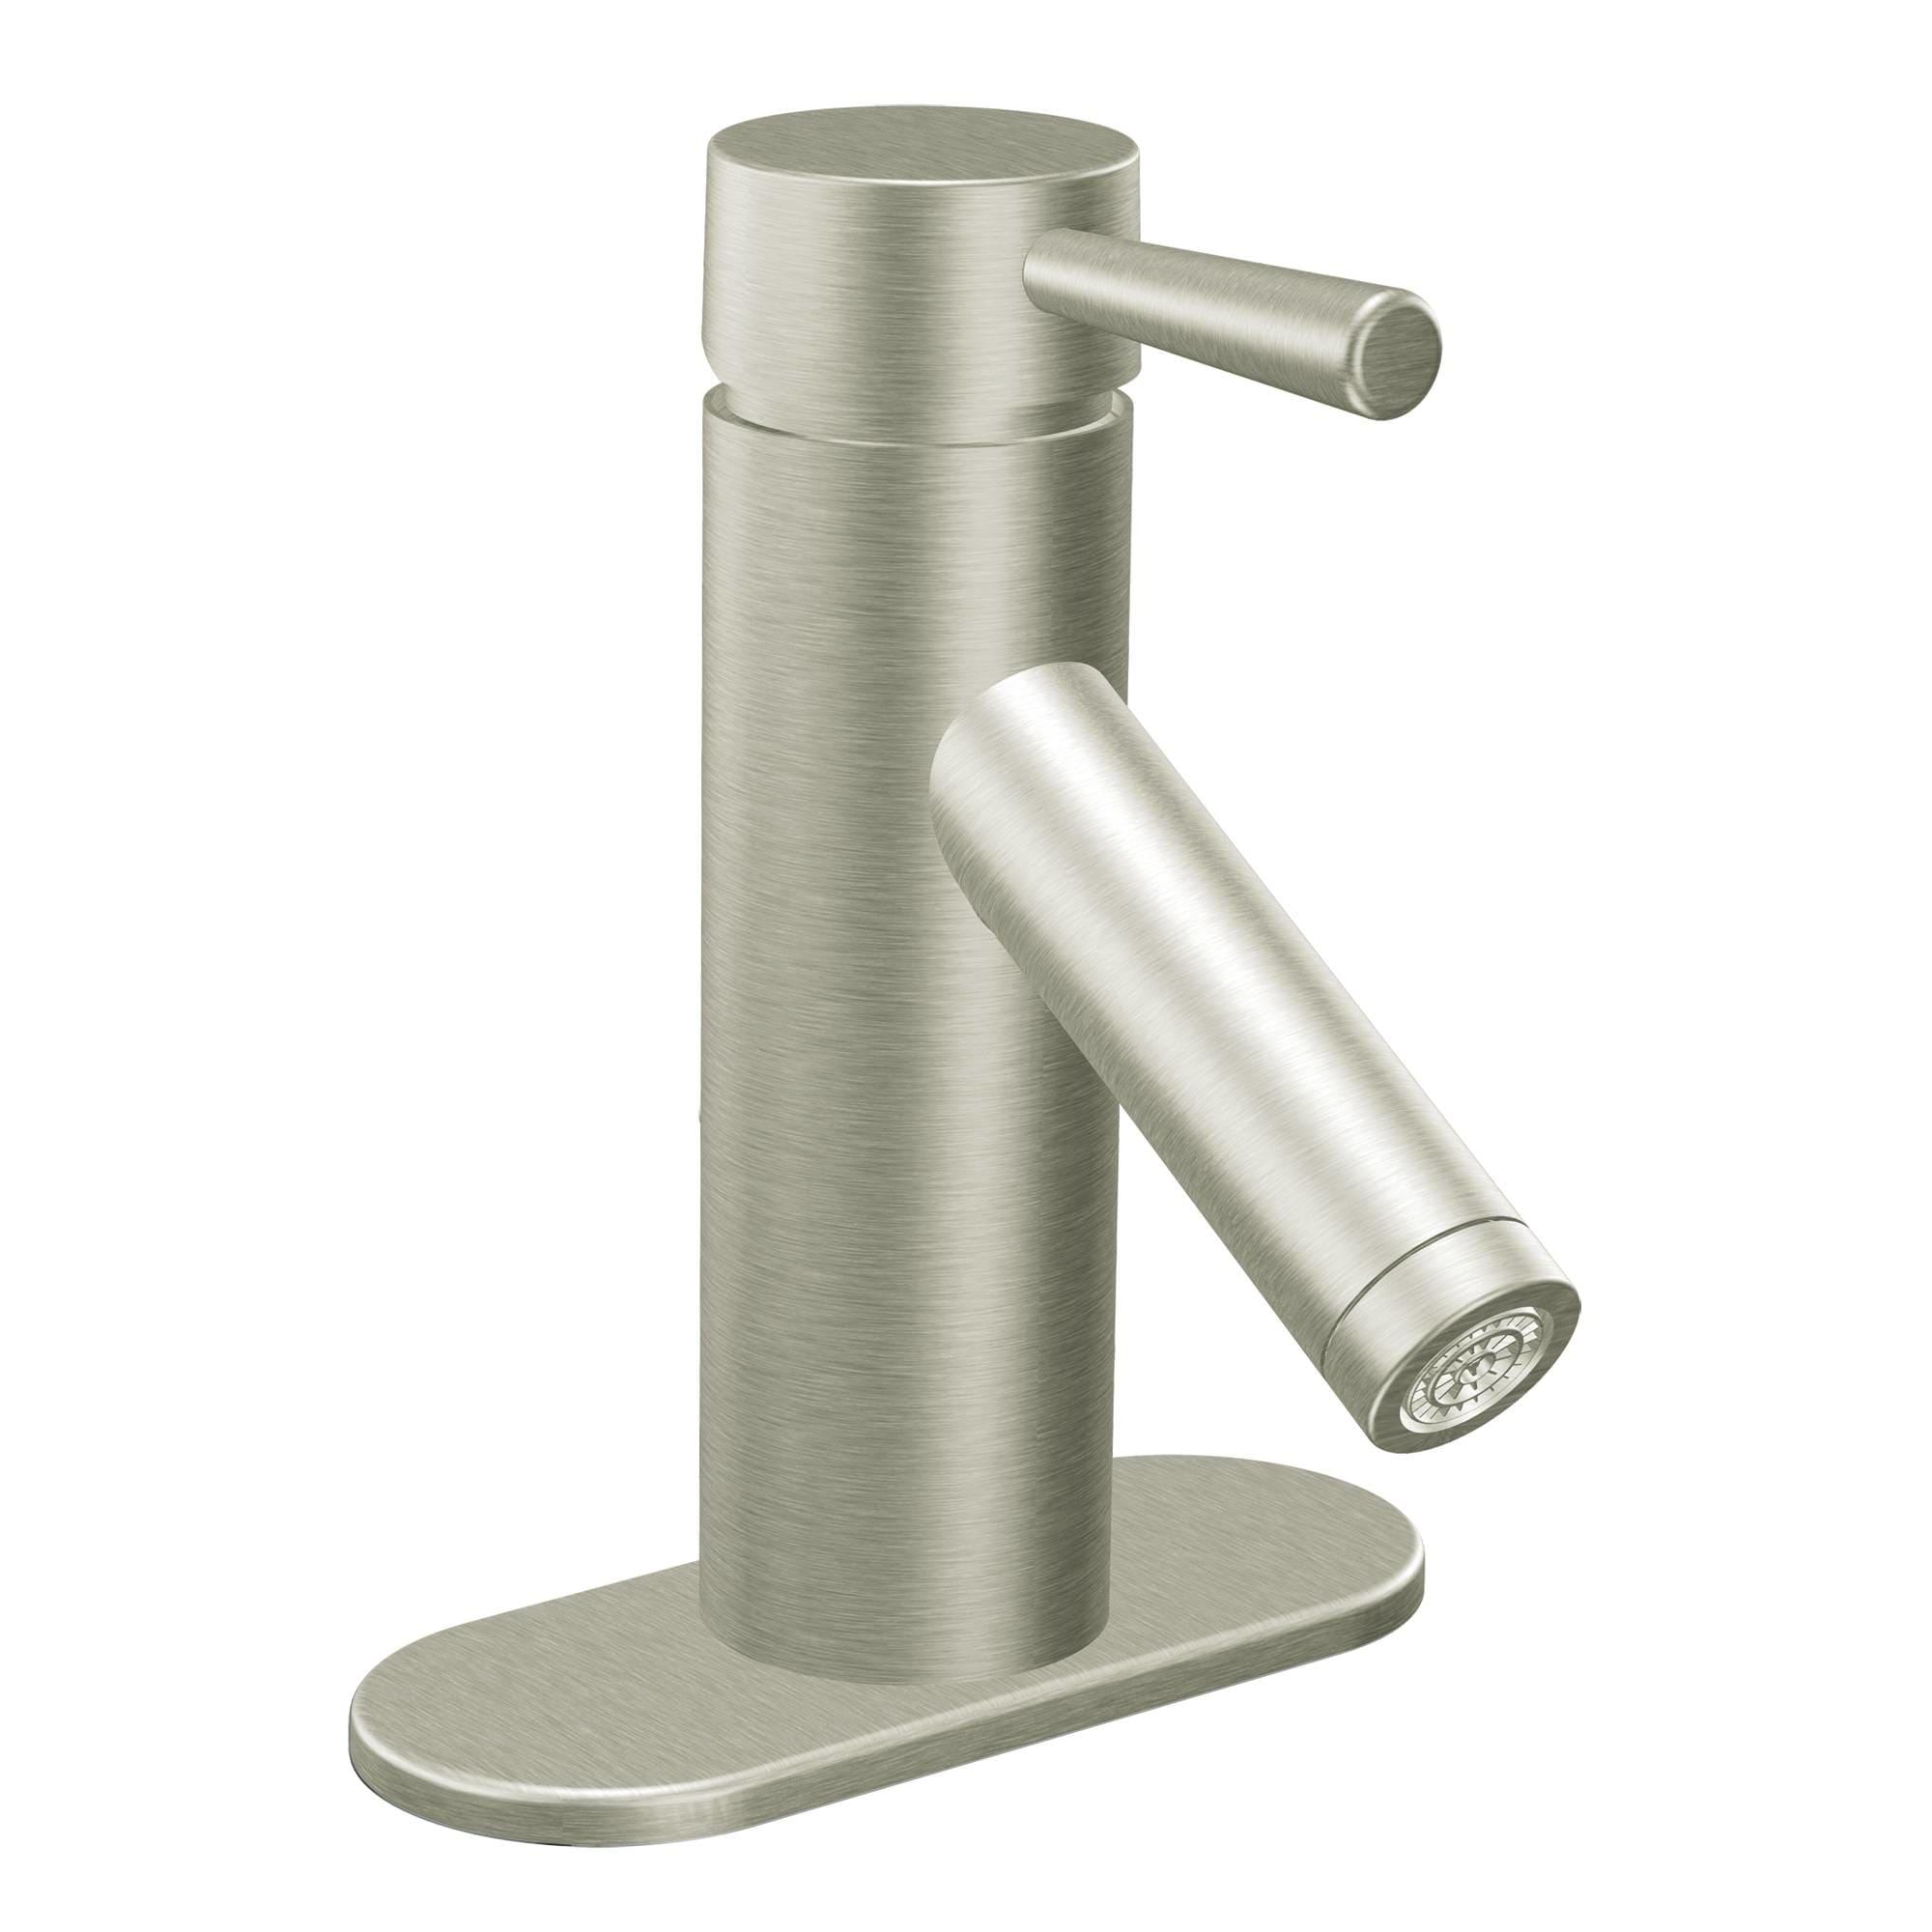 Moen 6100BN Brushed Nickel Single Handle Single Hole Bathroom Faucet ...